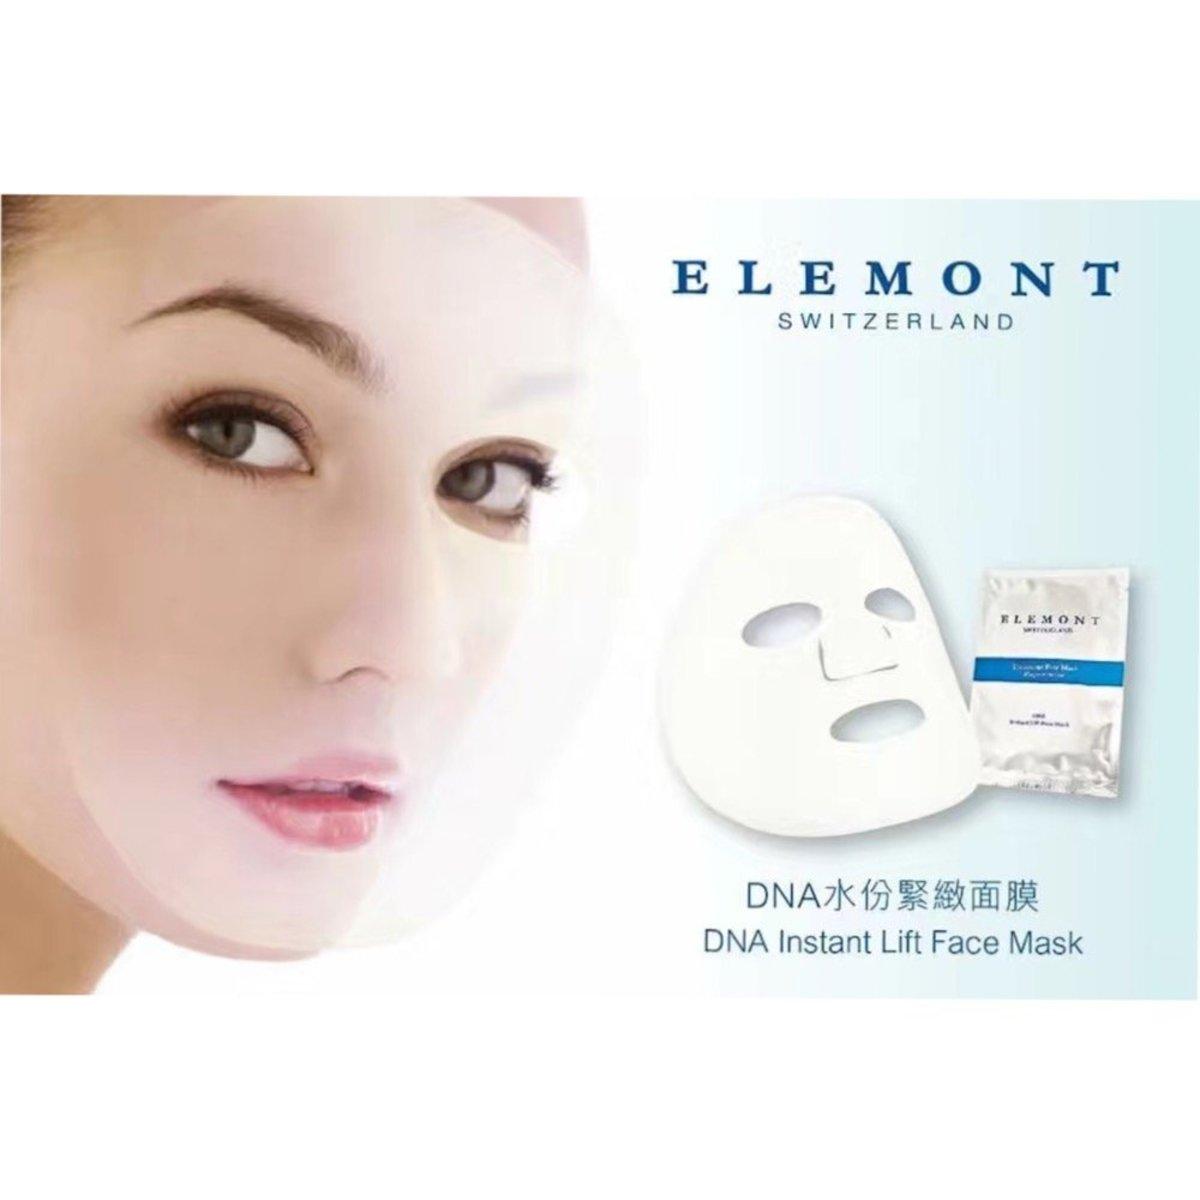 DNA Instant Lift Face Mask